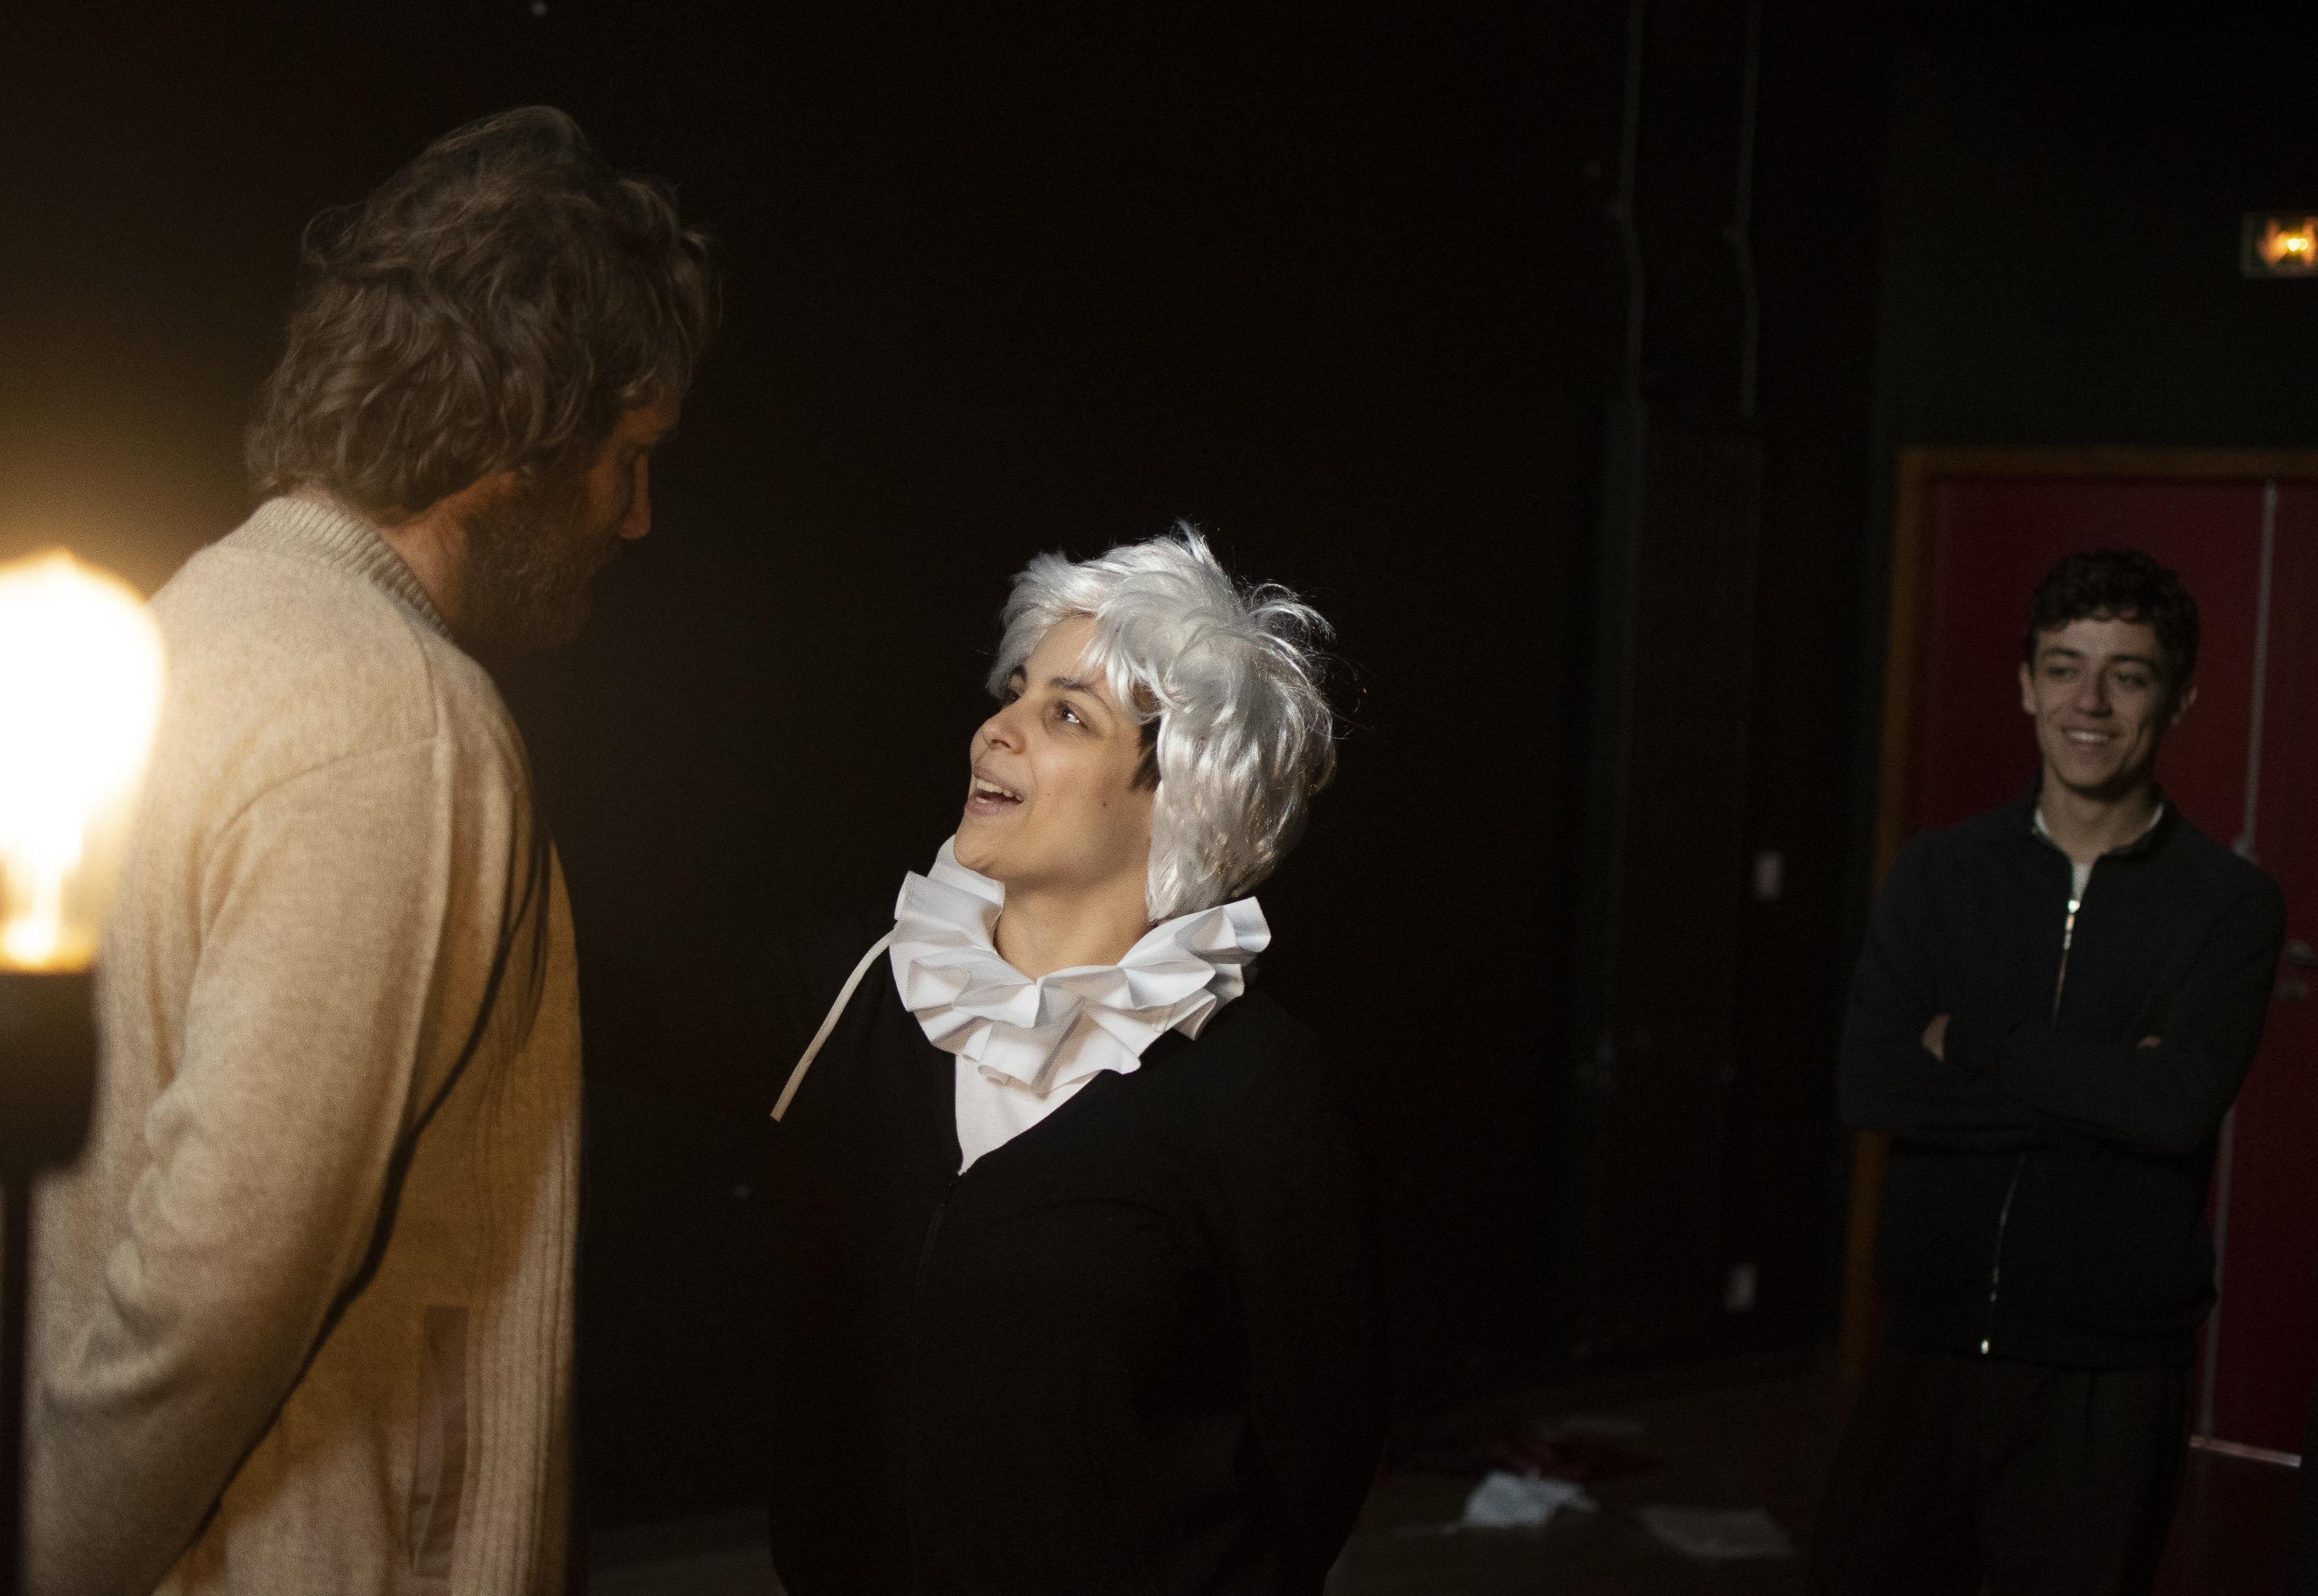 Joanny, Don Ruy Gomez admire Hugo